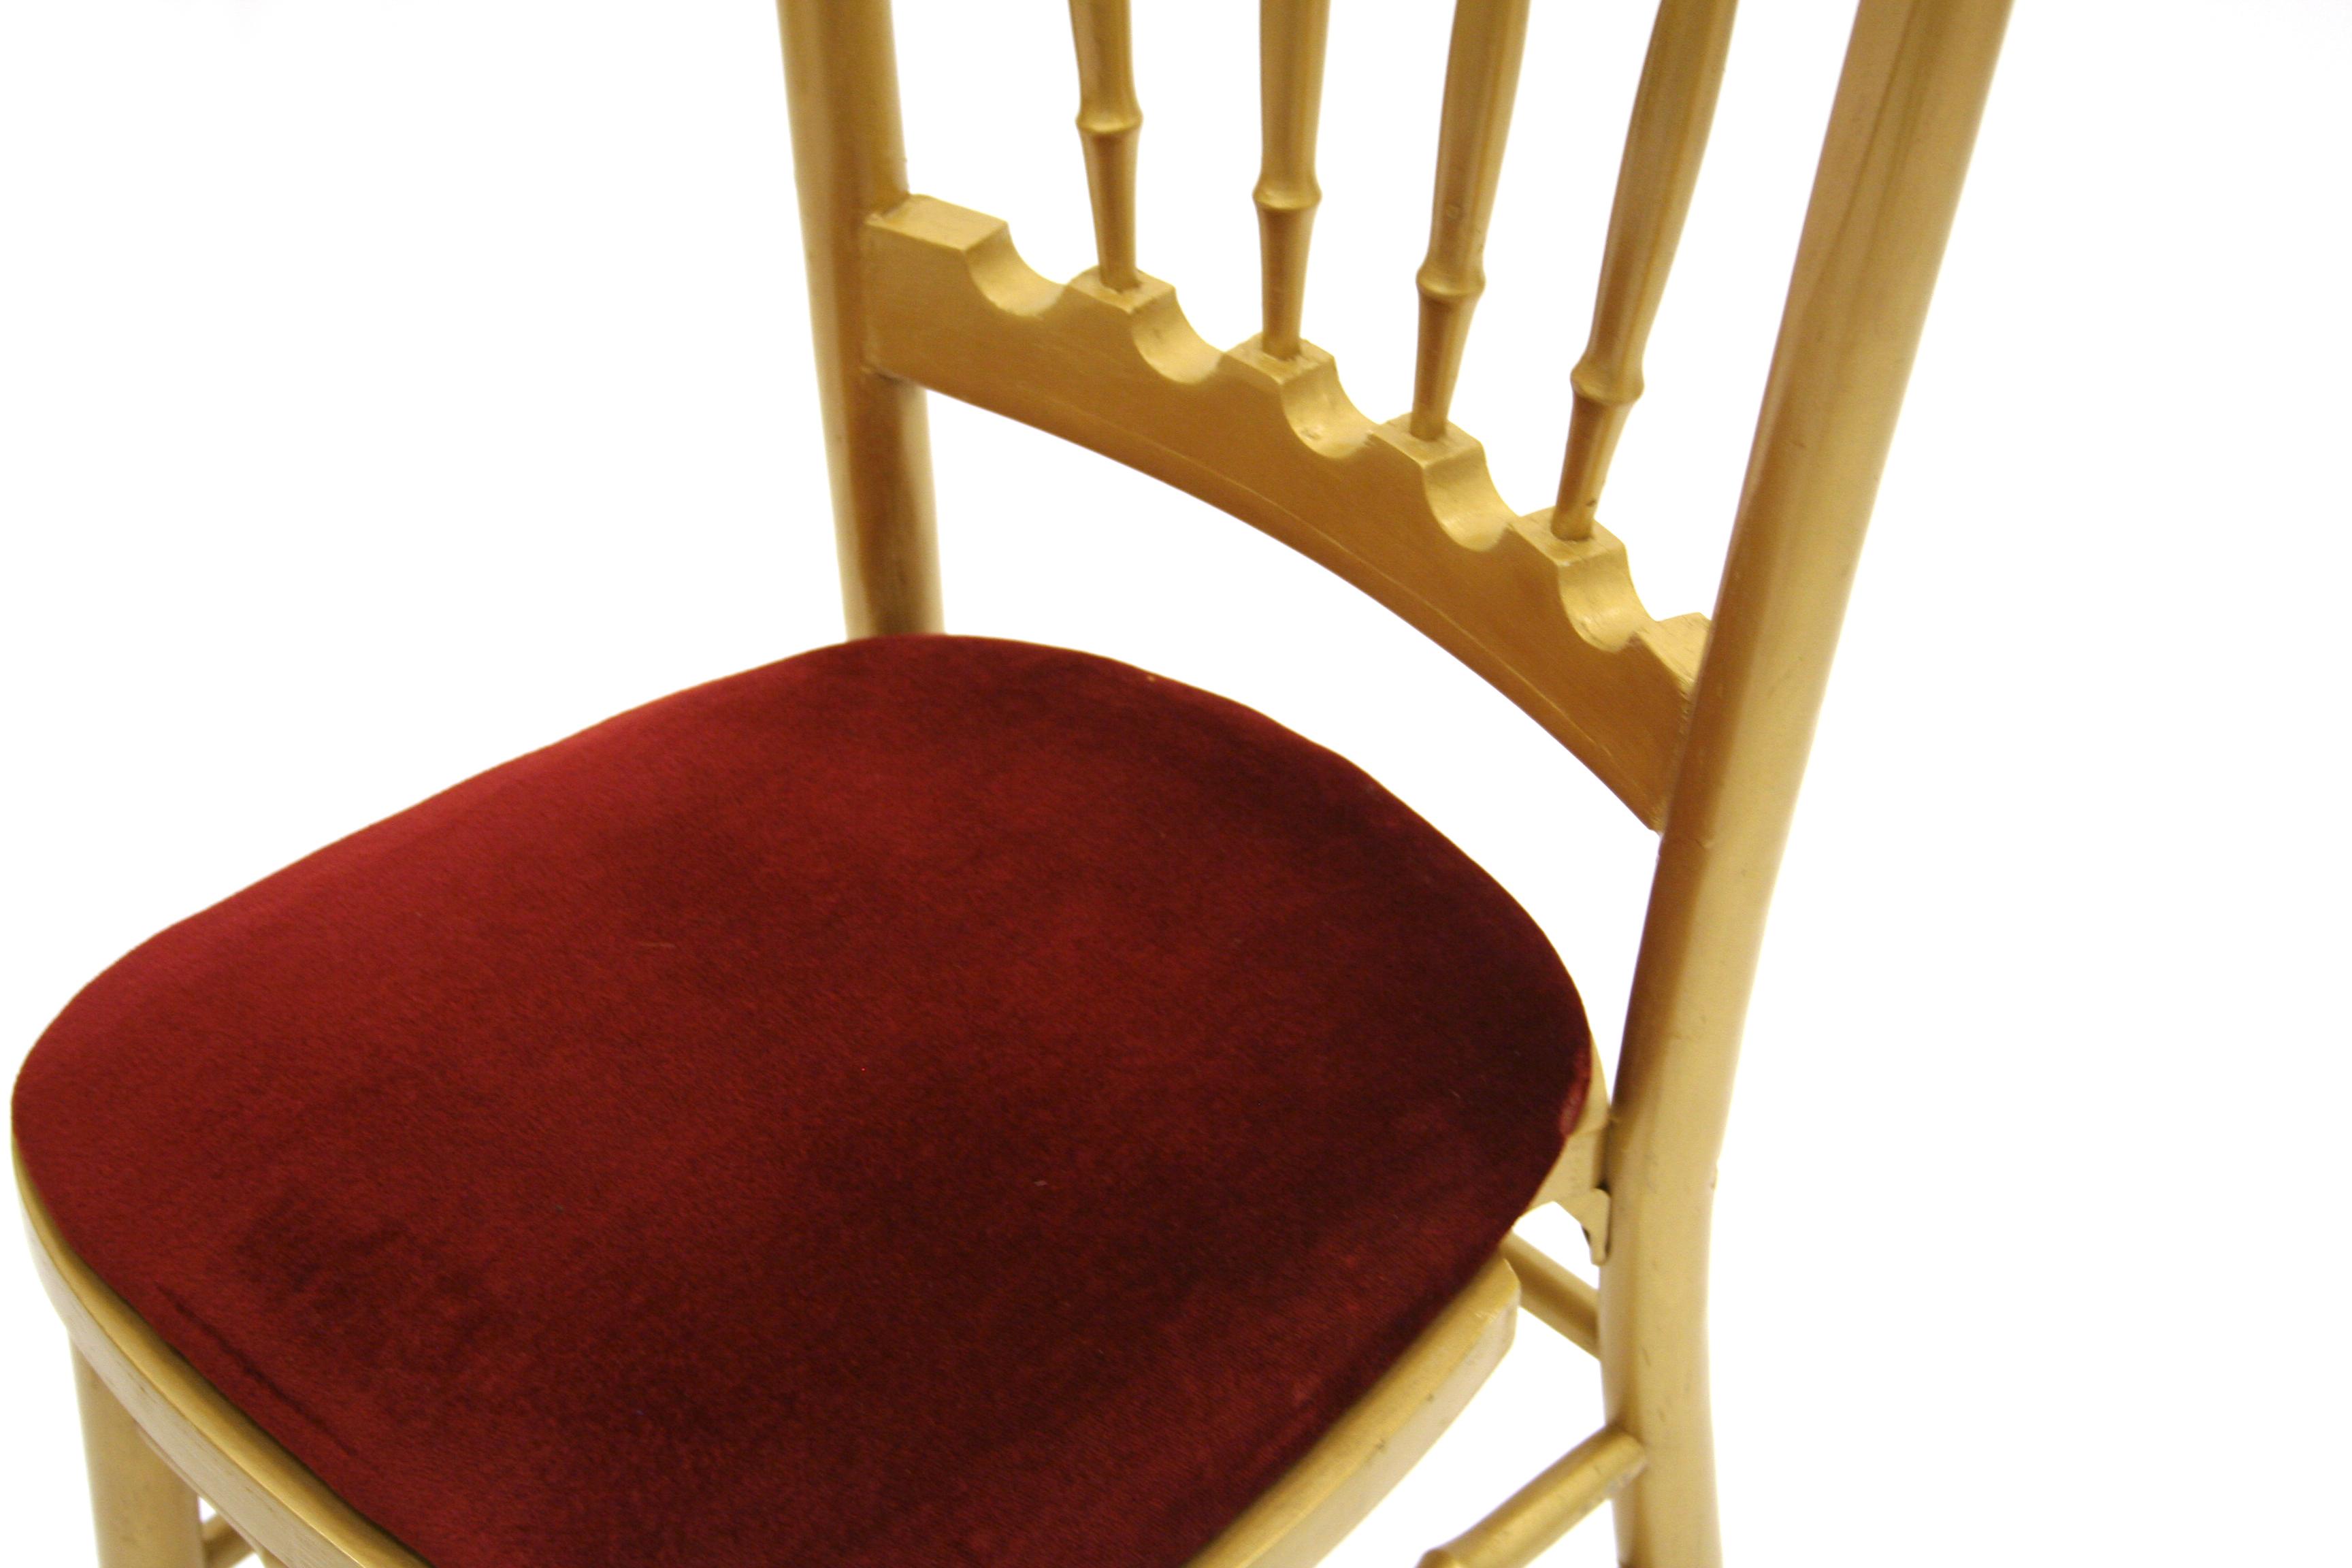 Gold Cheltenham Gilt Chairs For Hire Wooden Frame